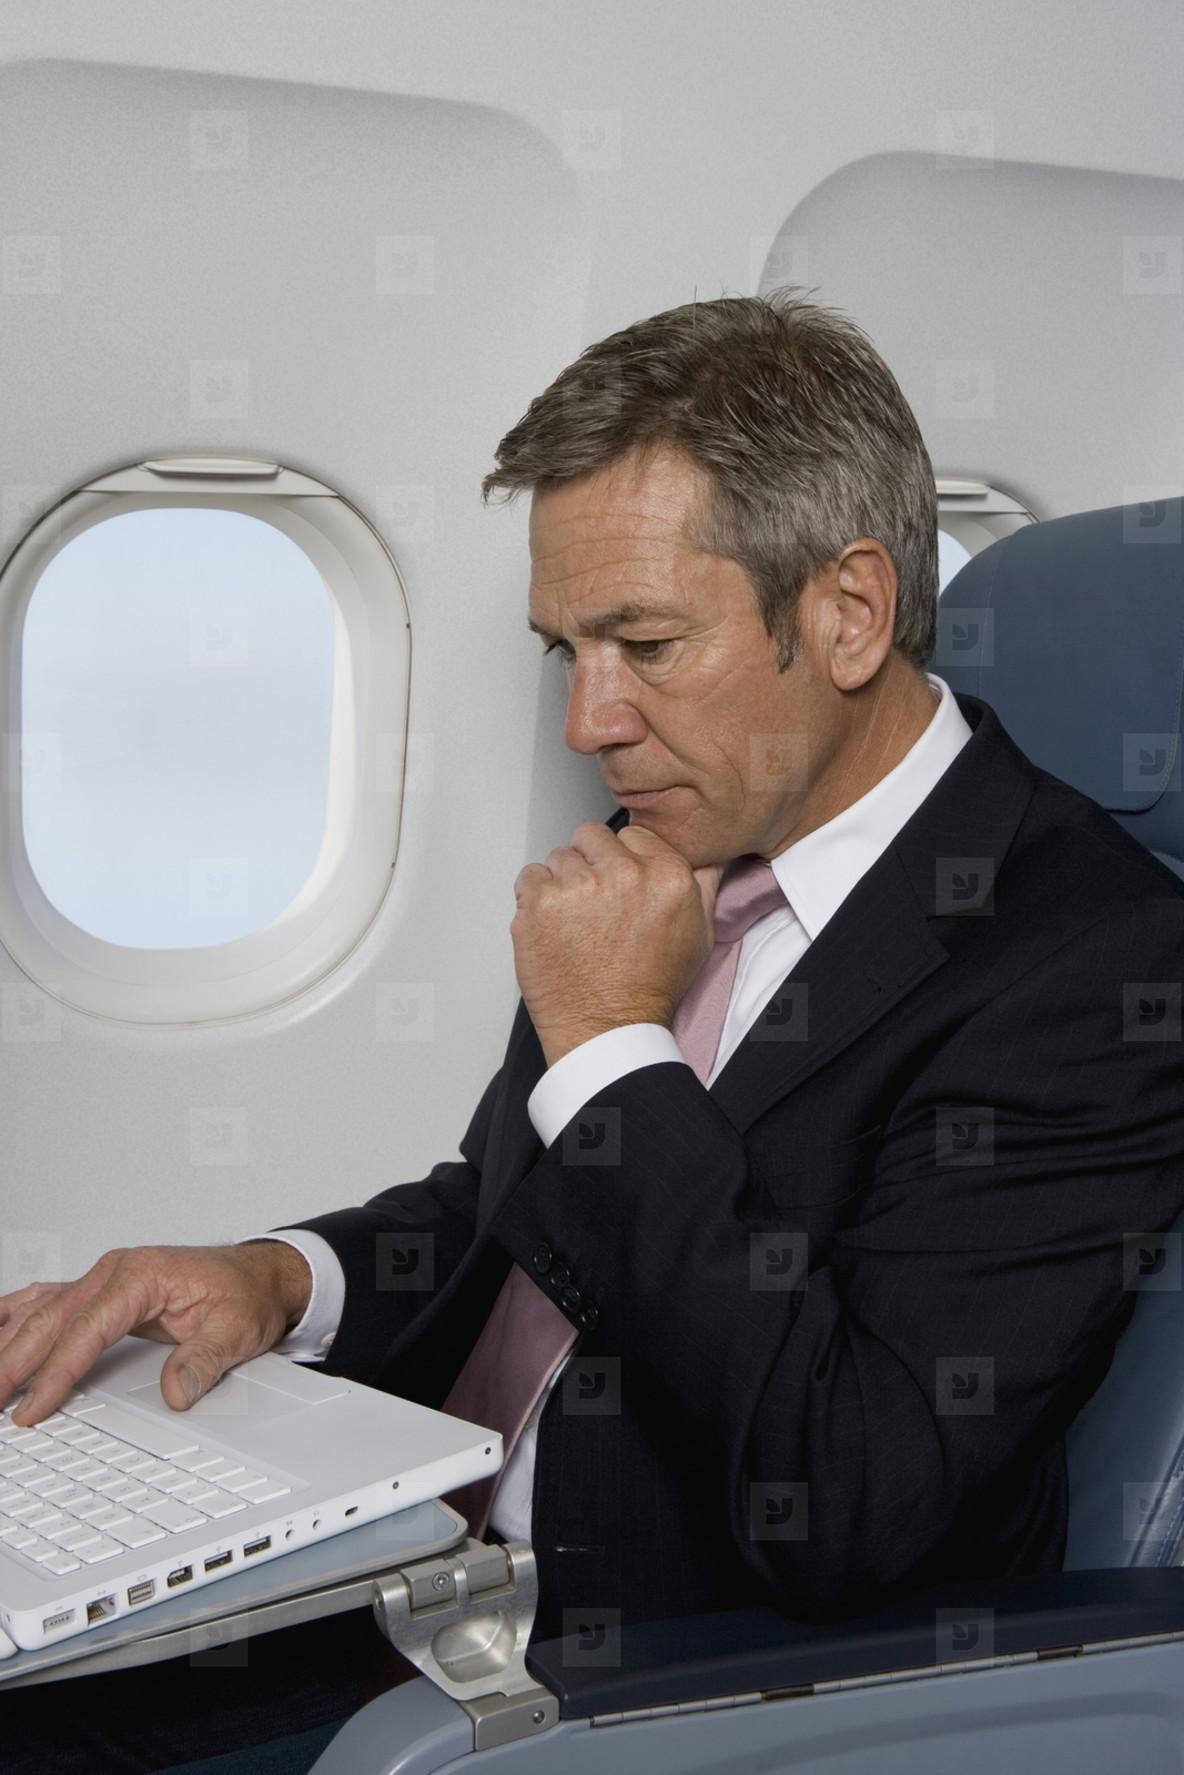 Airplane Travel  38